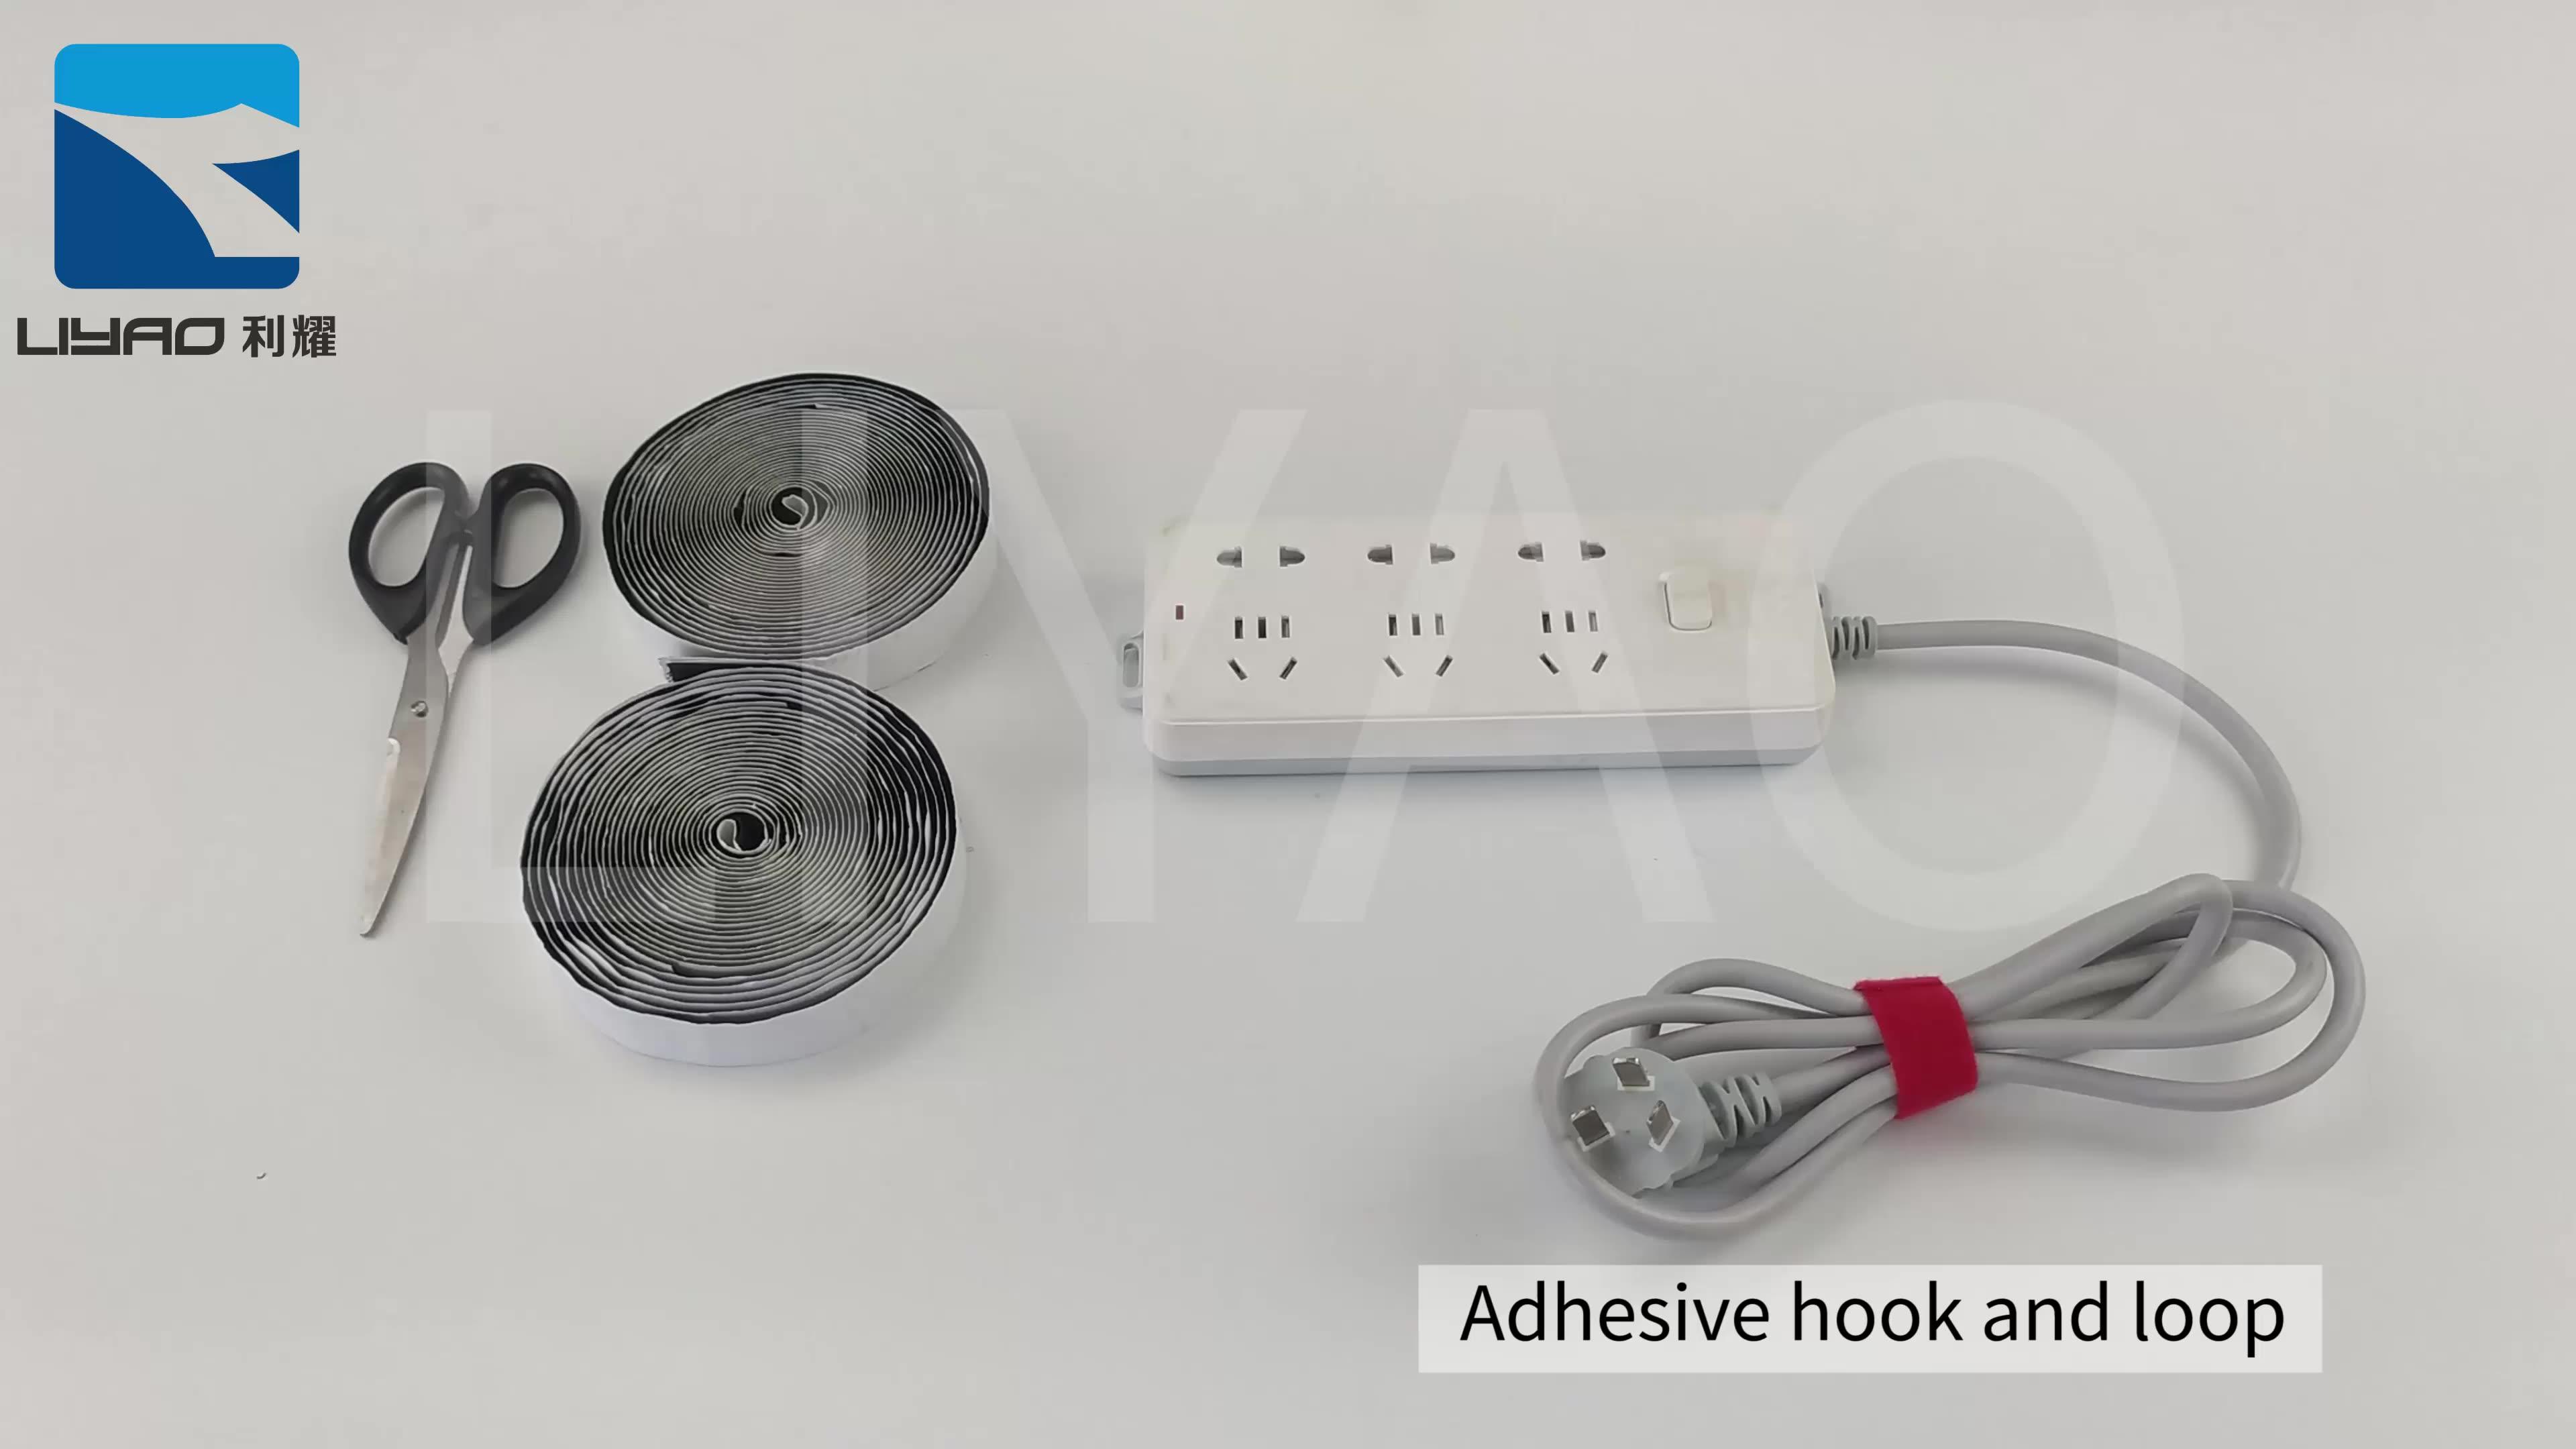 Custom 5mm 20mm Printed Self Adhesive Fastener Soft Nylon Fabric Hook And Loop Tape Sheet Roll